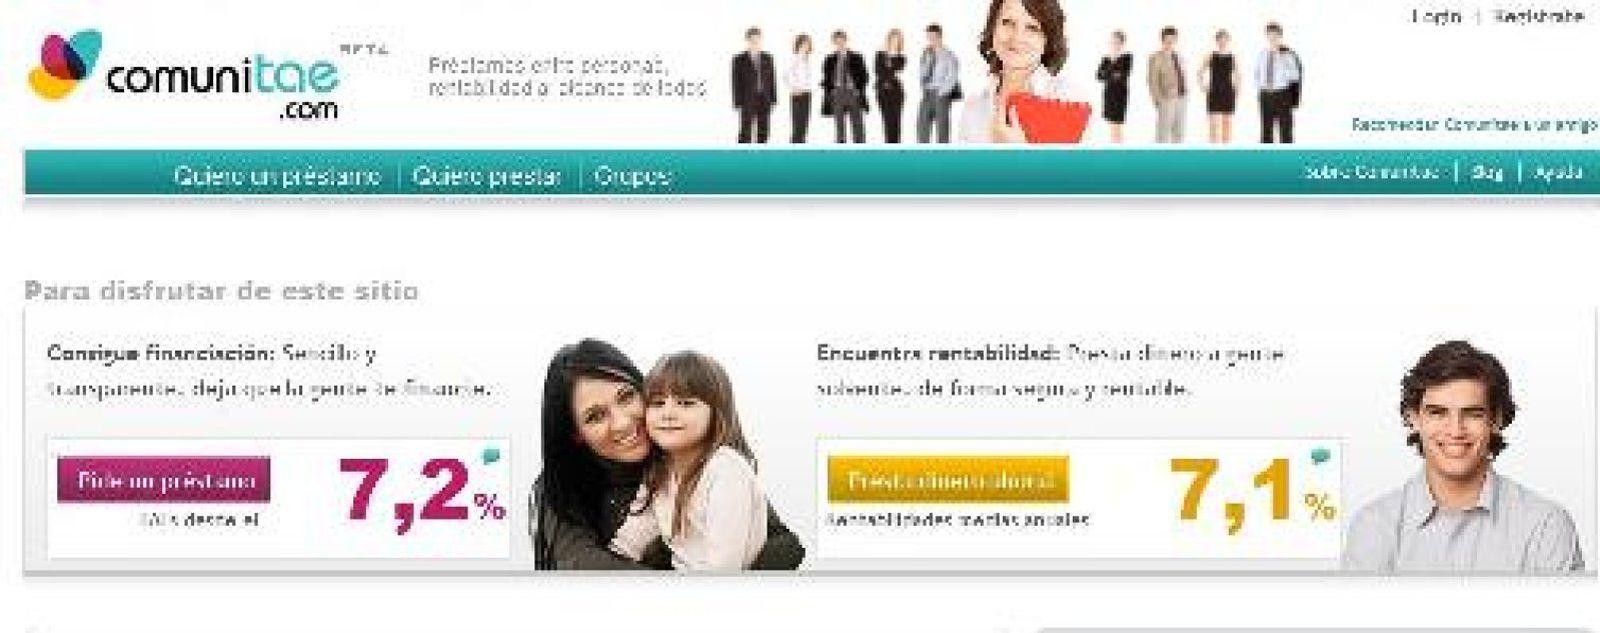 Prestamos entre particulares junta de andalucia educacion for Oficina virtual junta de andalucia